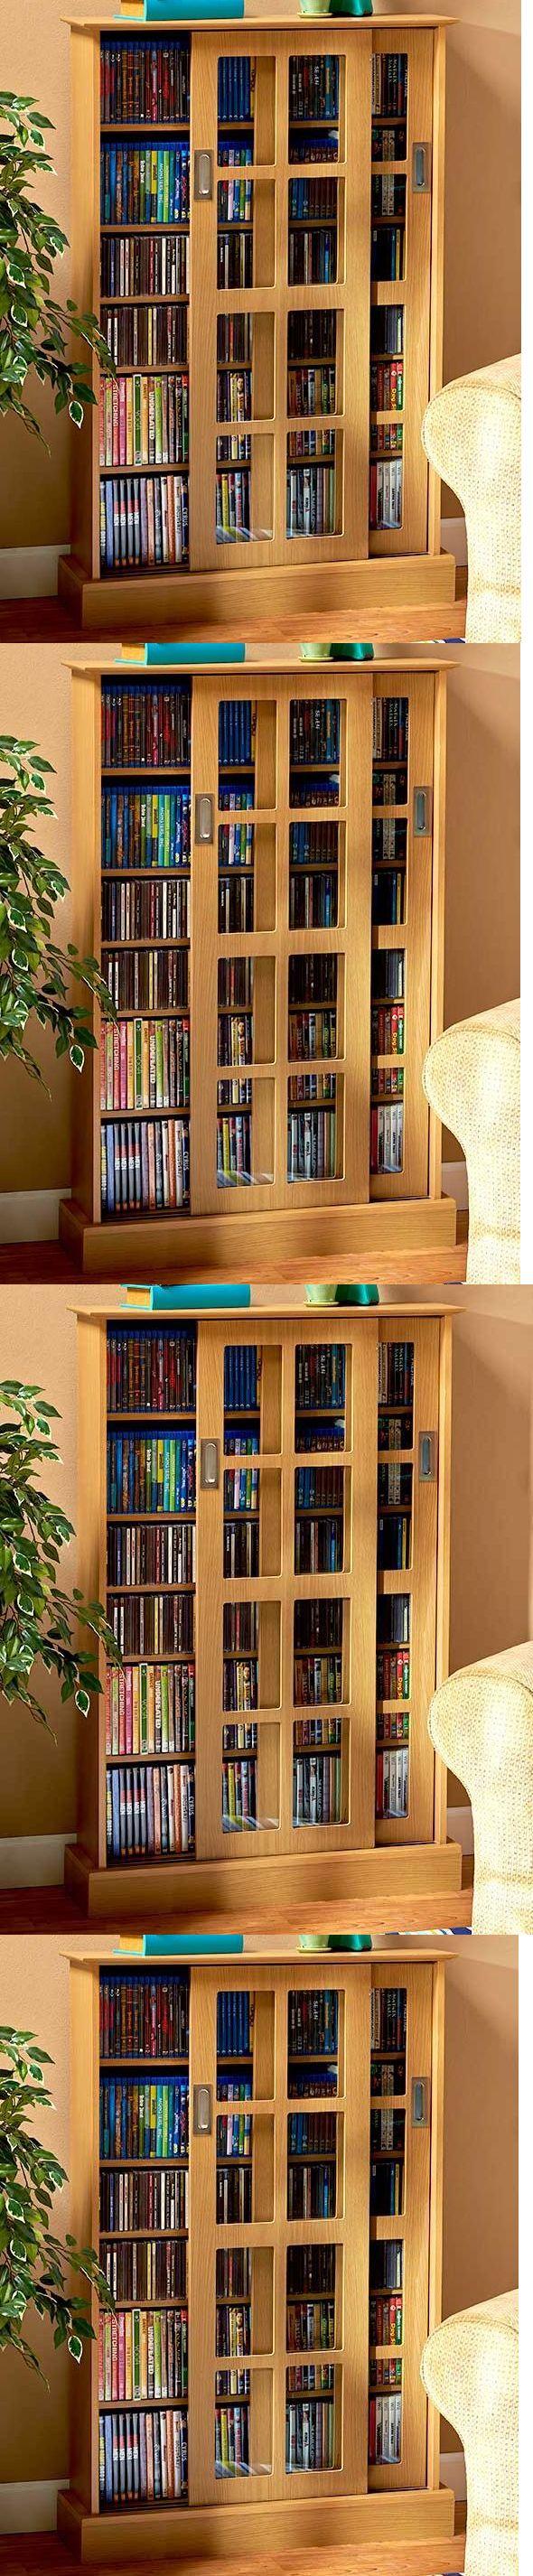 Cd Storage Tower  Sliding Door Bookshelf